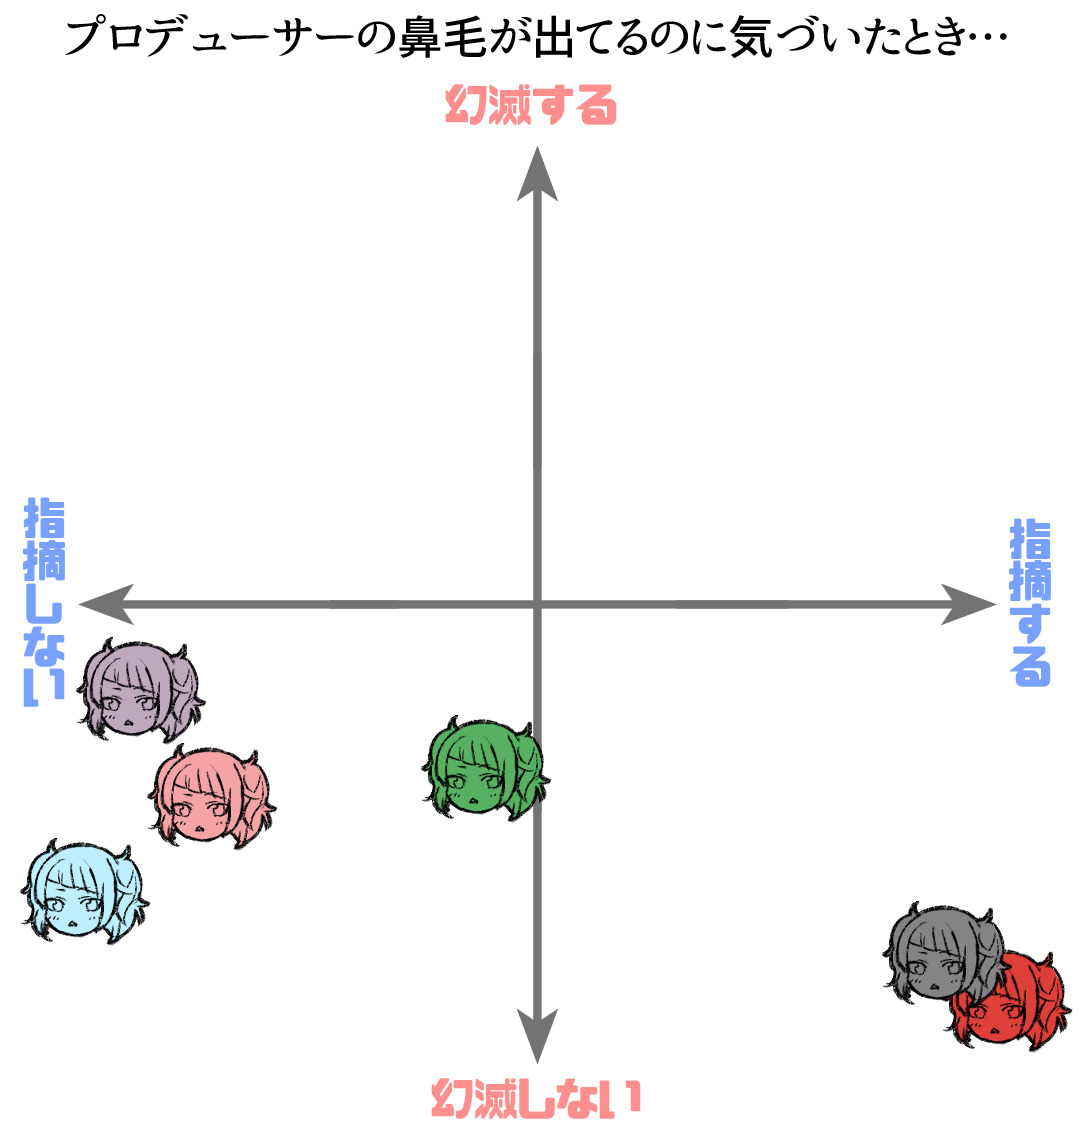 f:id:hoshi_sano:20200414111509j:image:w400